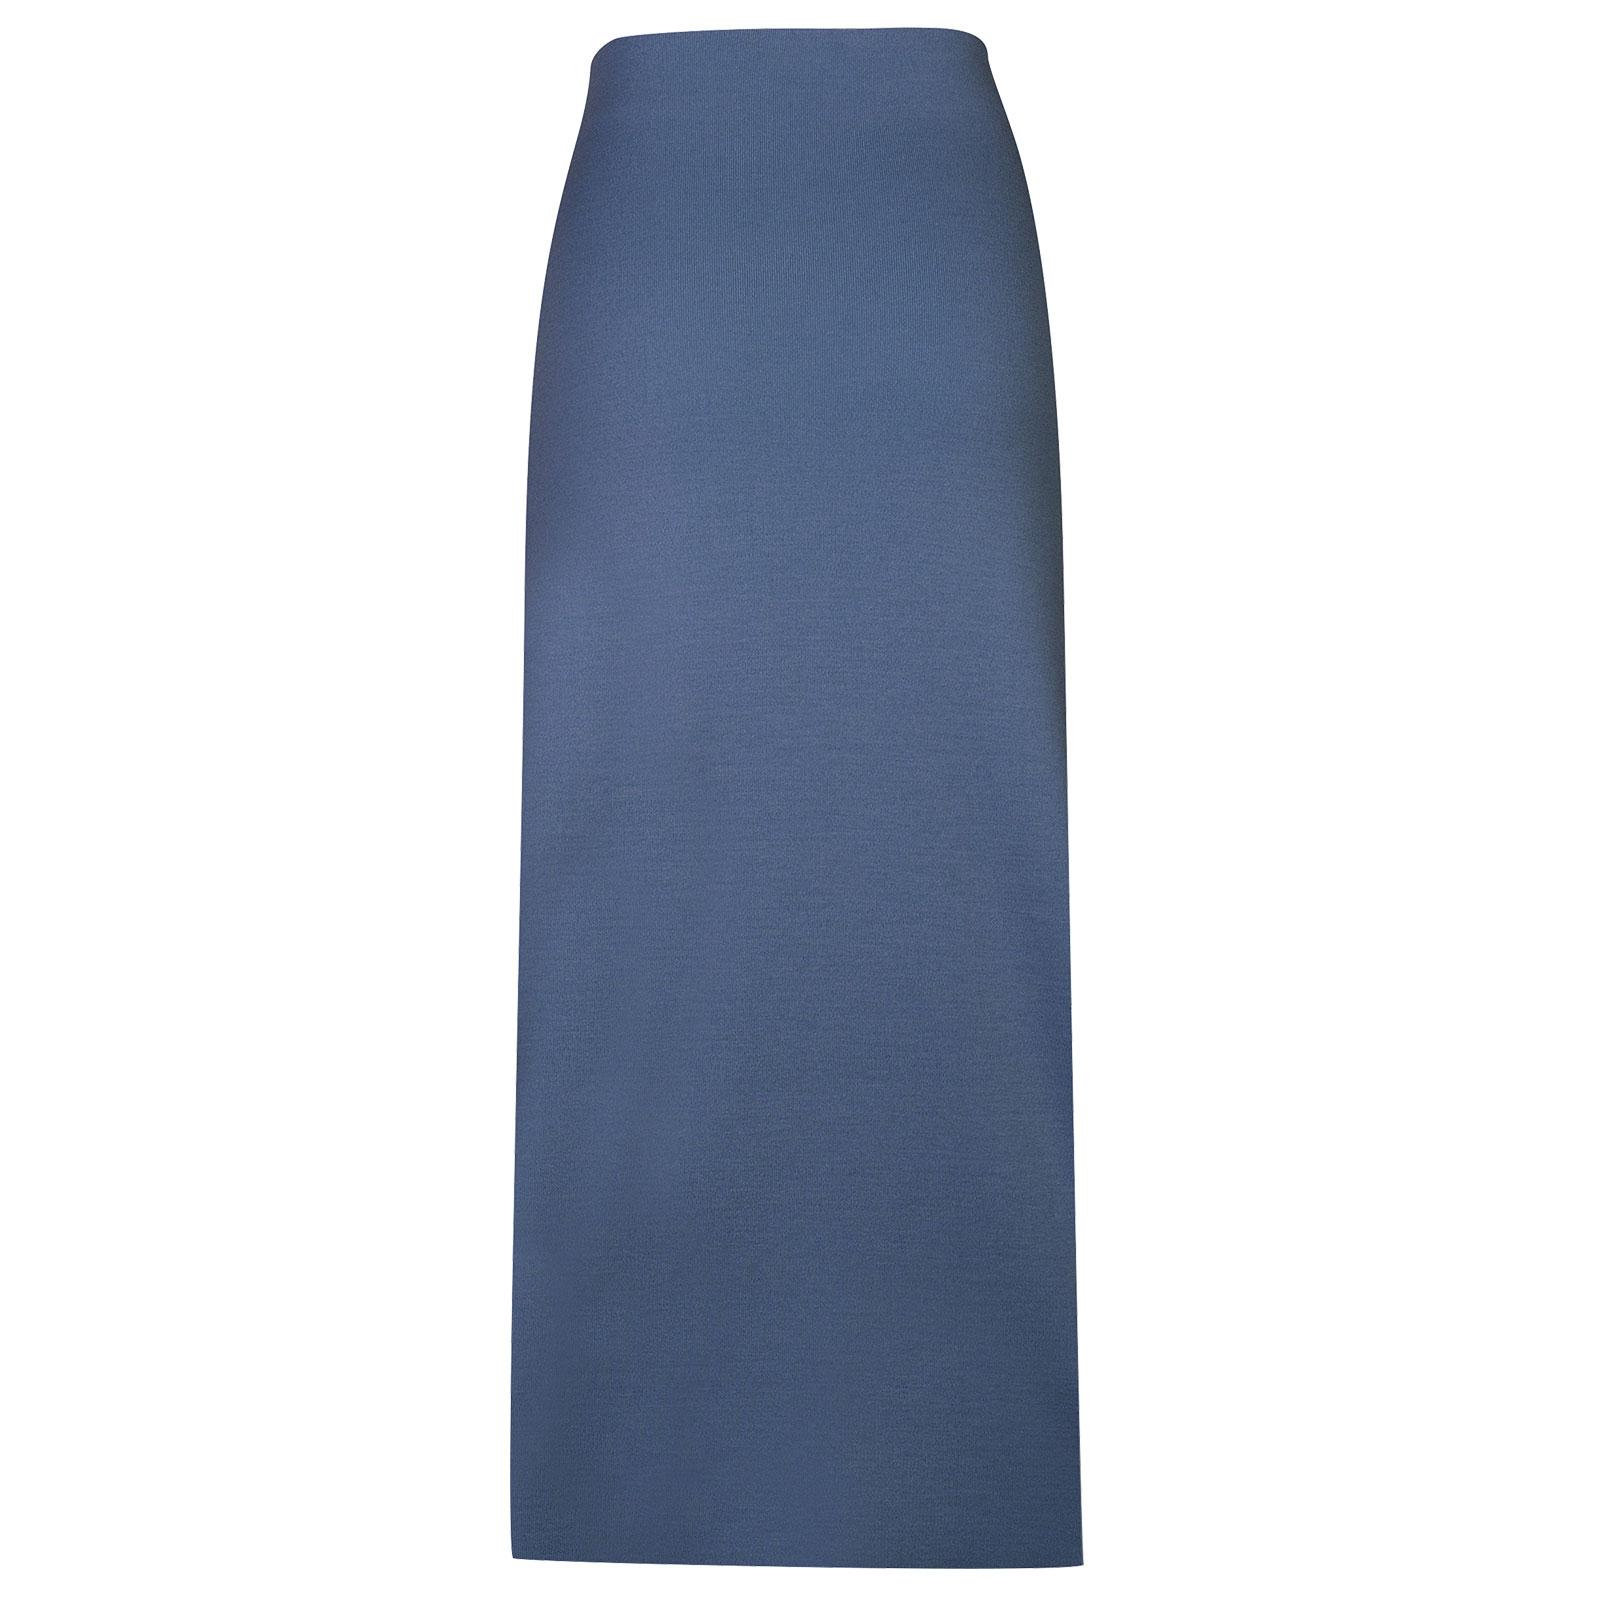 John Smedley moran in Blue Iris John Smedley Skirt-LGE